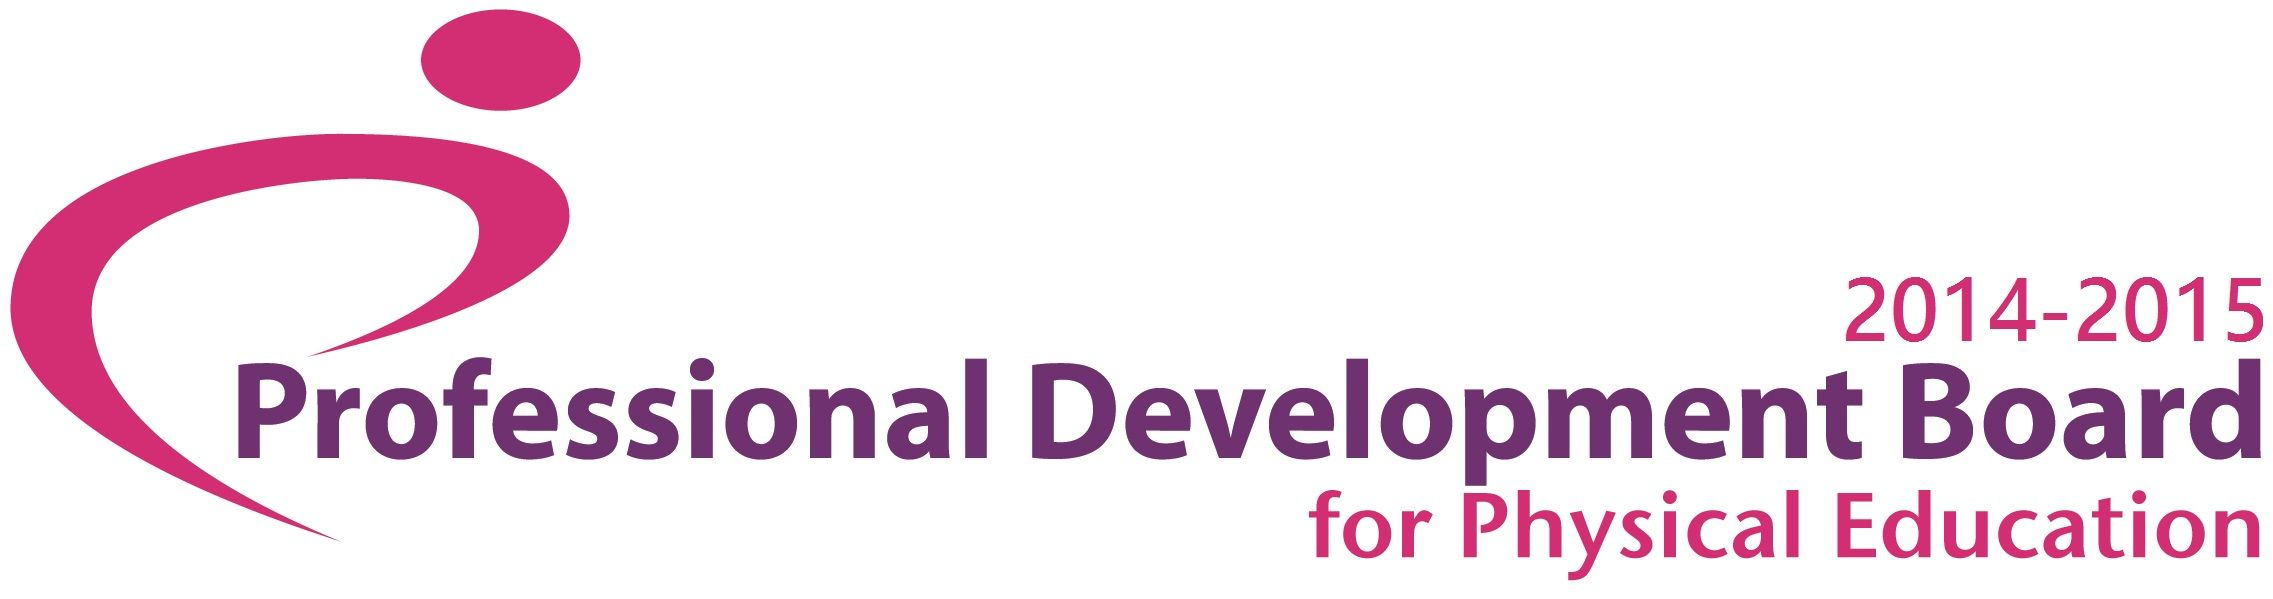 Professional Development Board 2014-2015